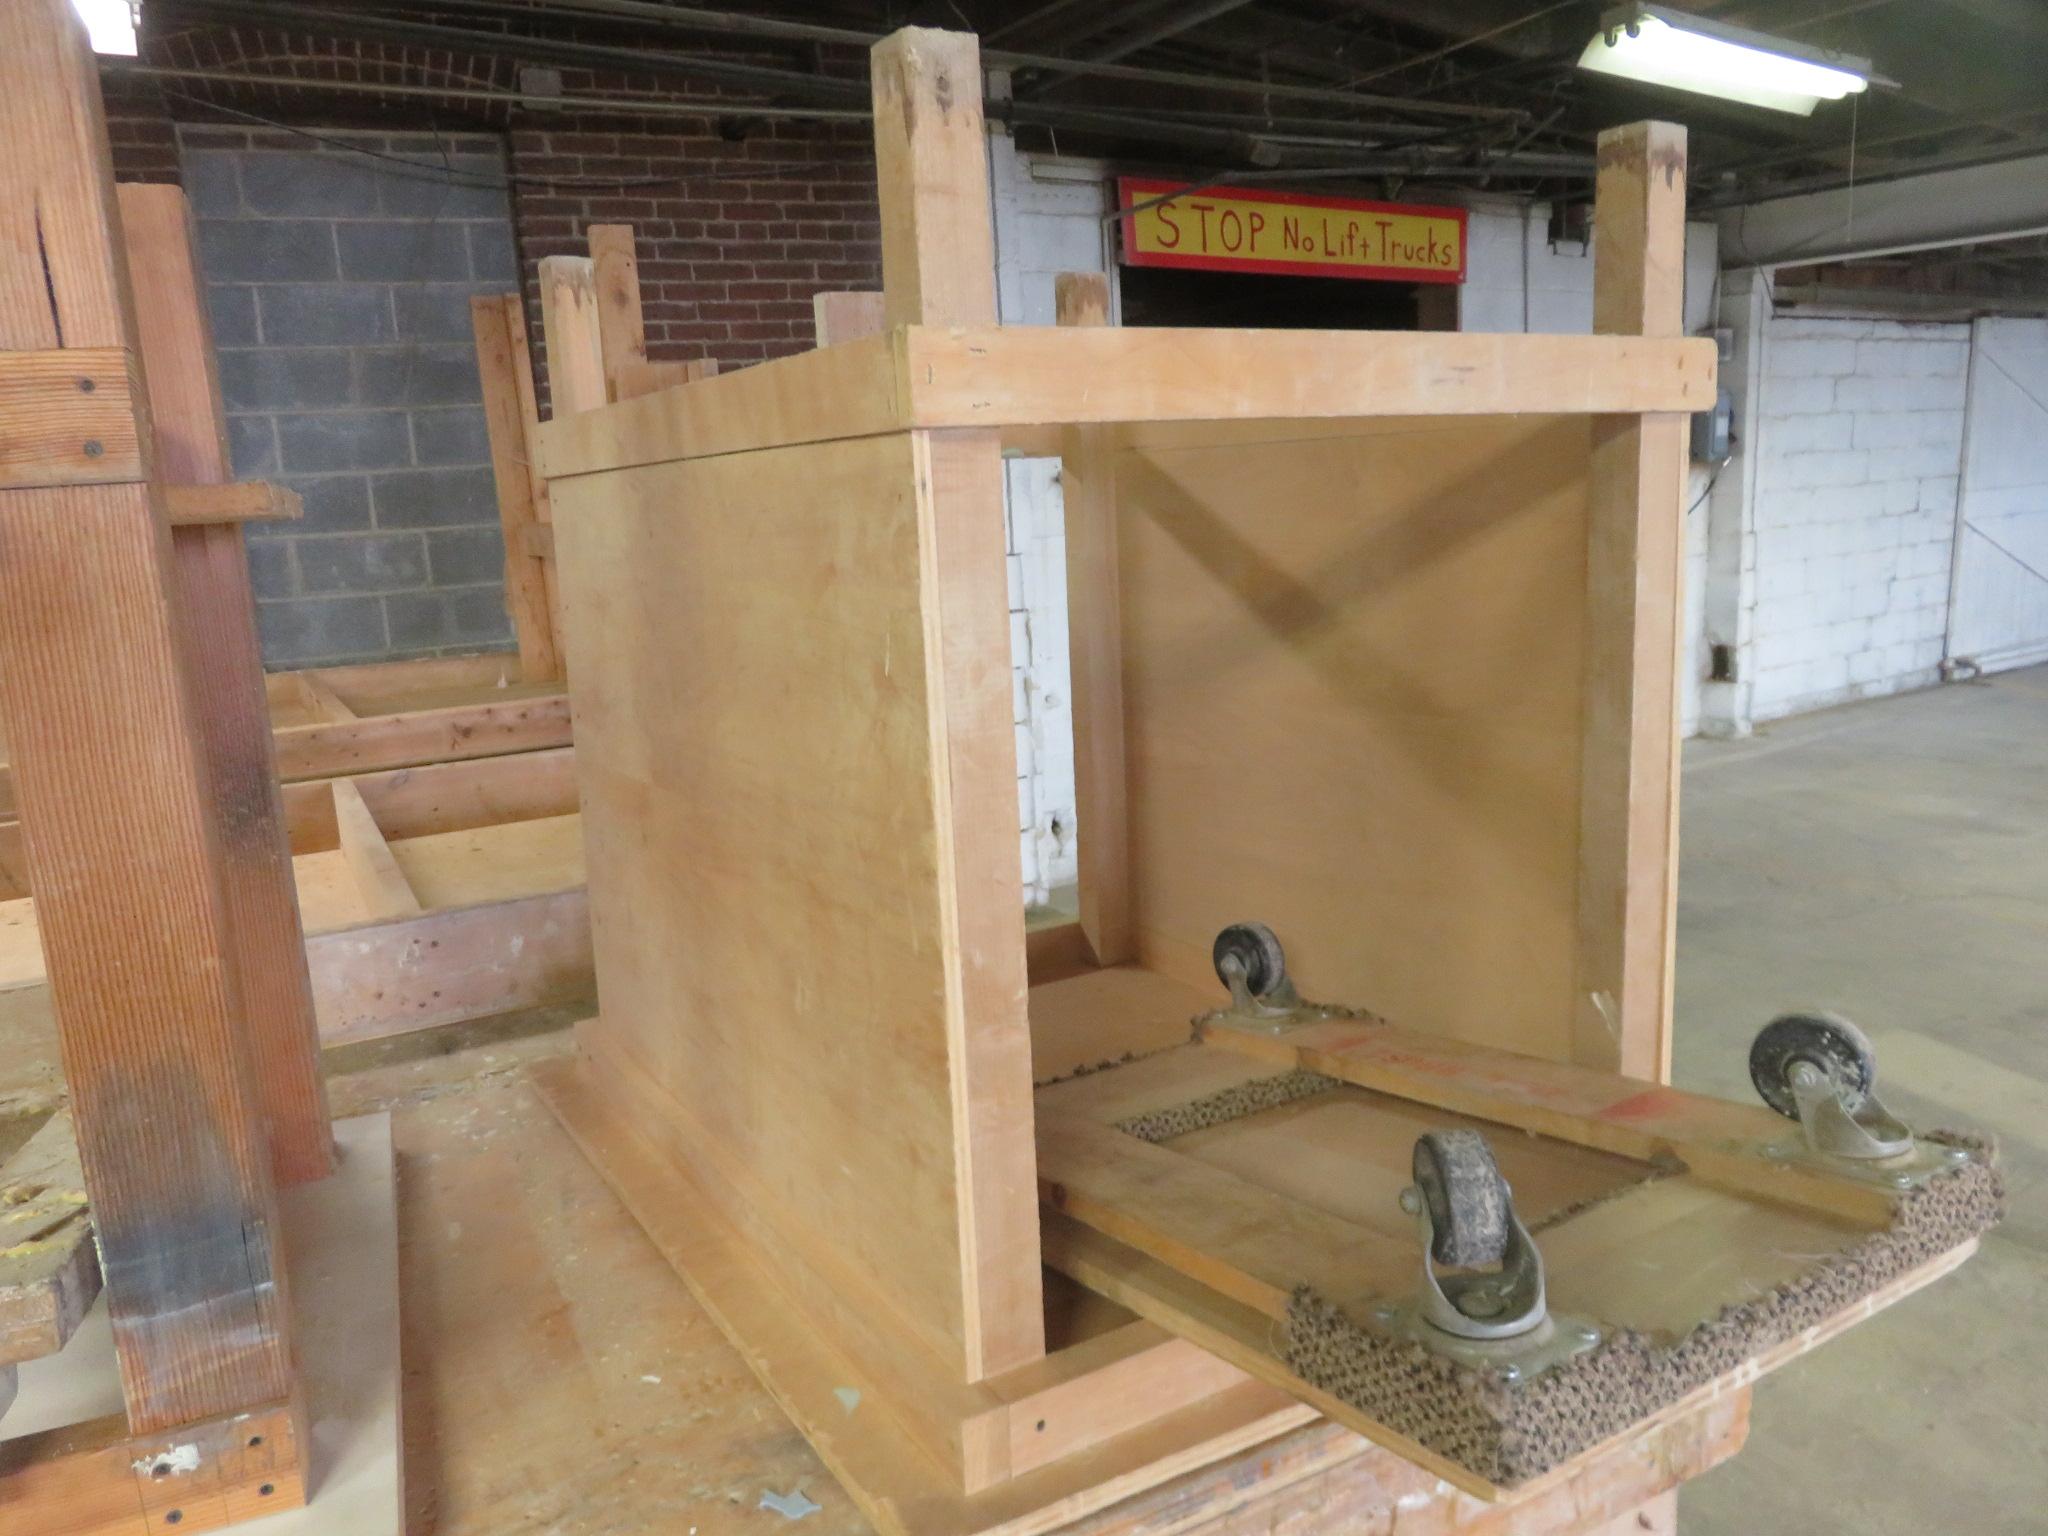 "Heavy Duty Wooden Work Tables Lot of 3 approx 96""x 48""x 36, 38""x 32""x 34"" 60""x 28""x 36"""